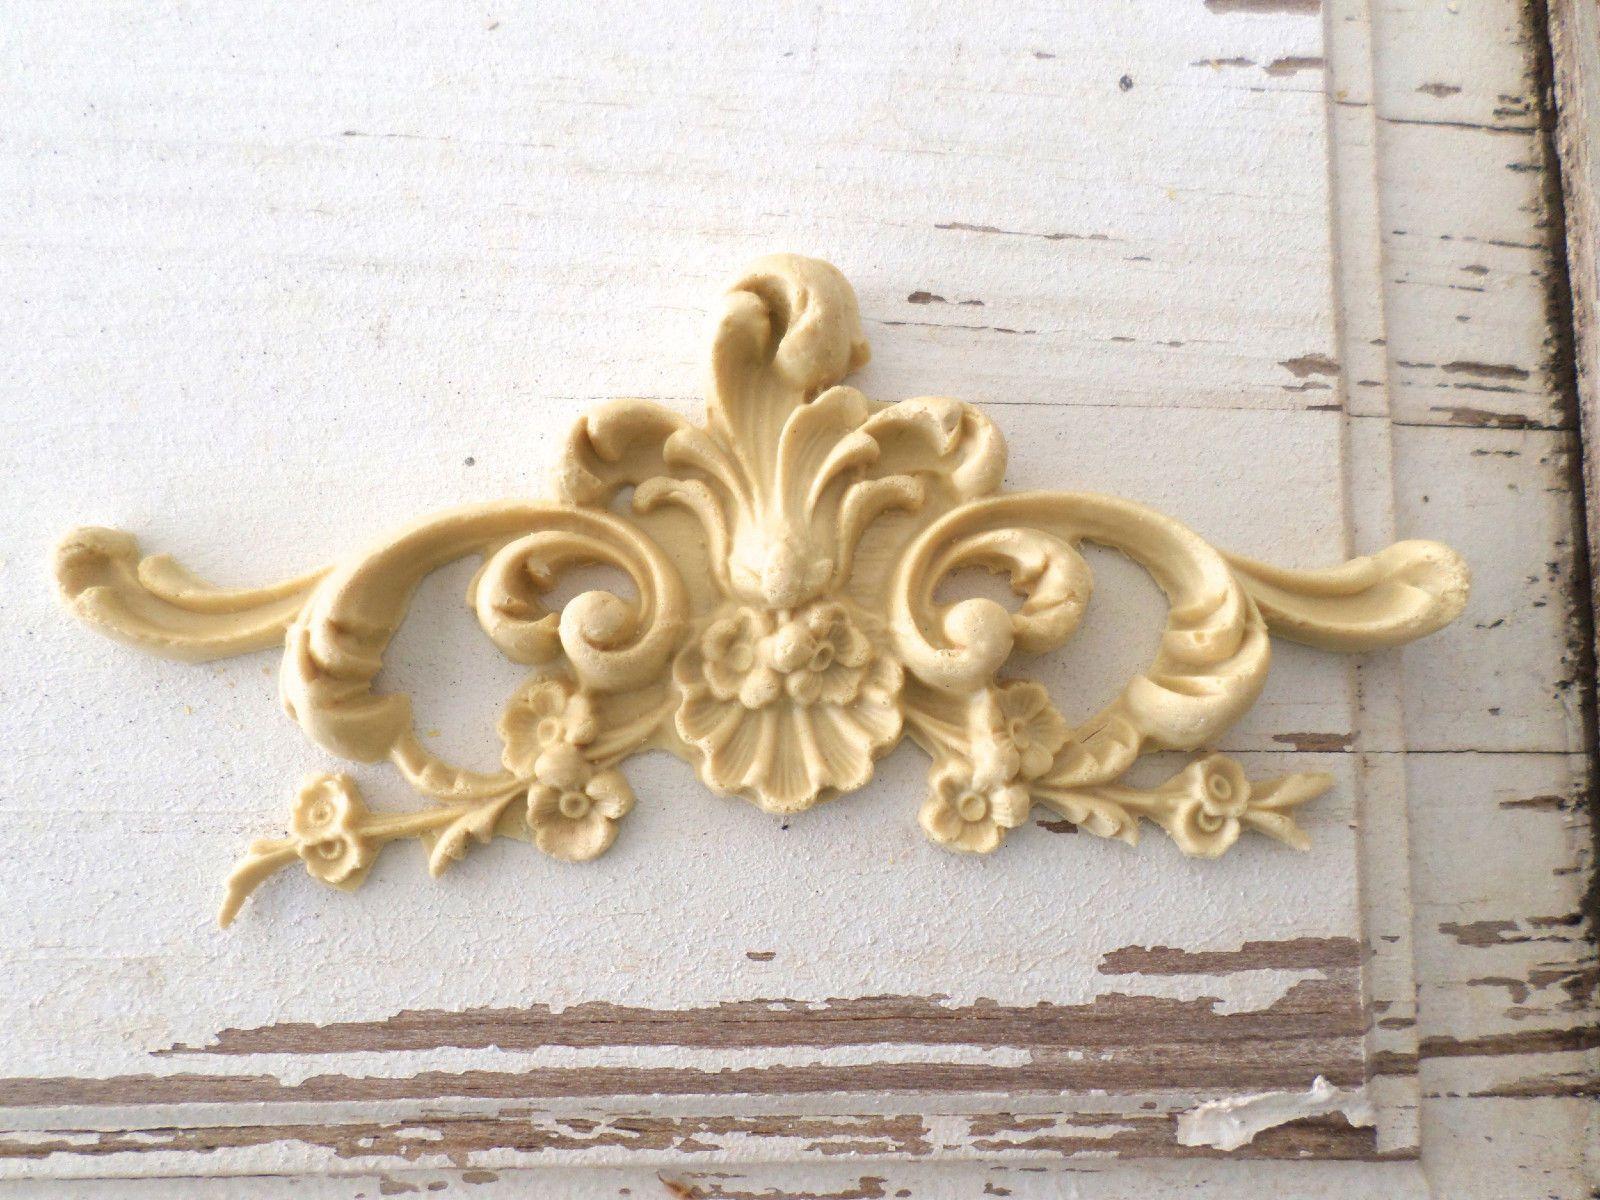 Architectural Carved Floral Crest Furniture Appliques Wood & Resin